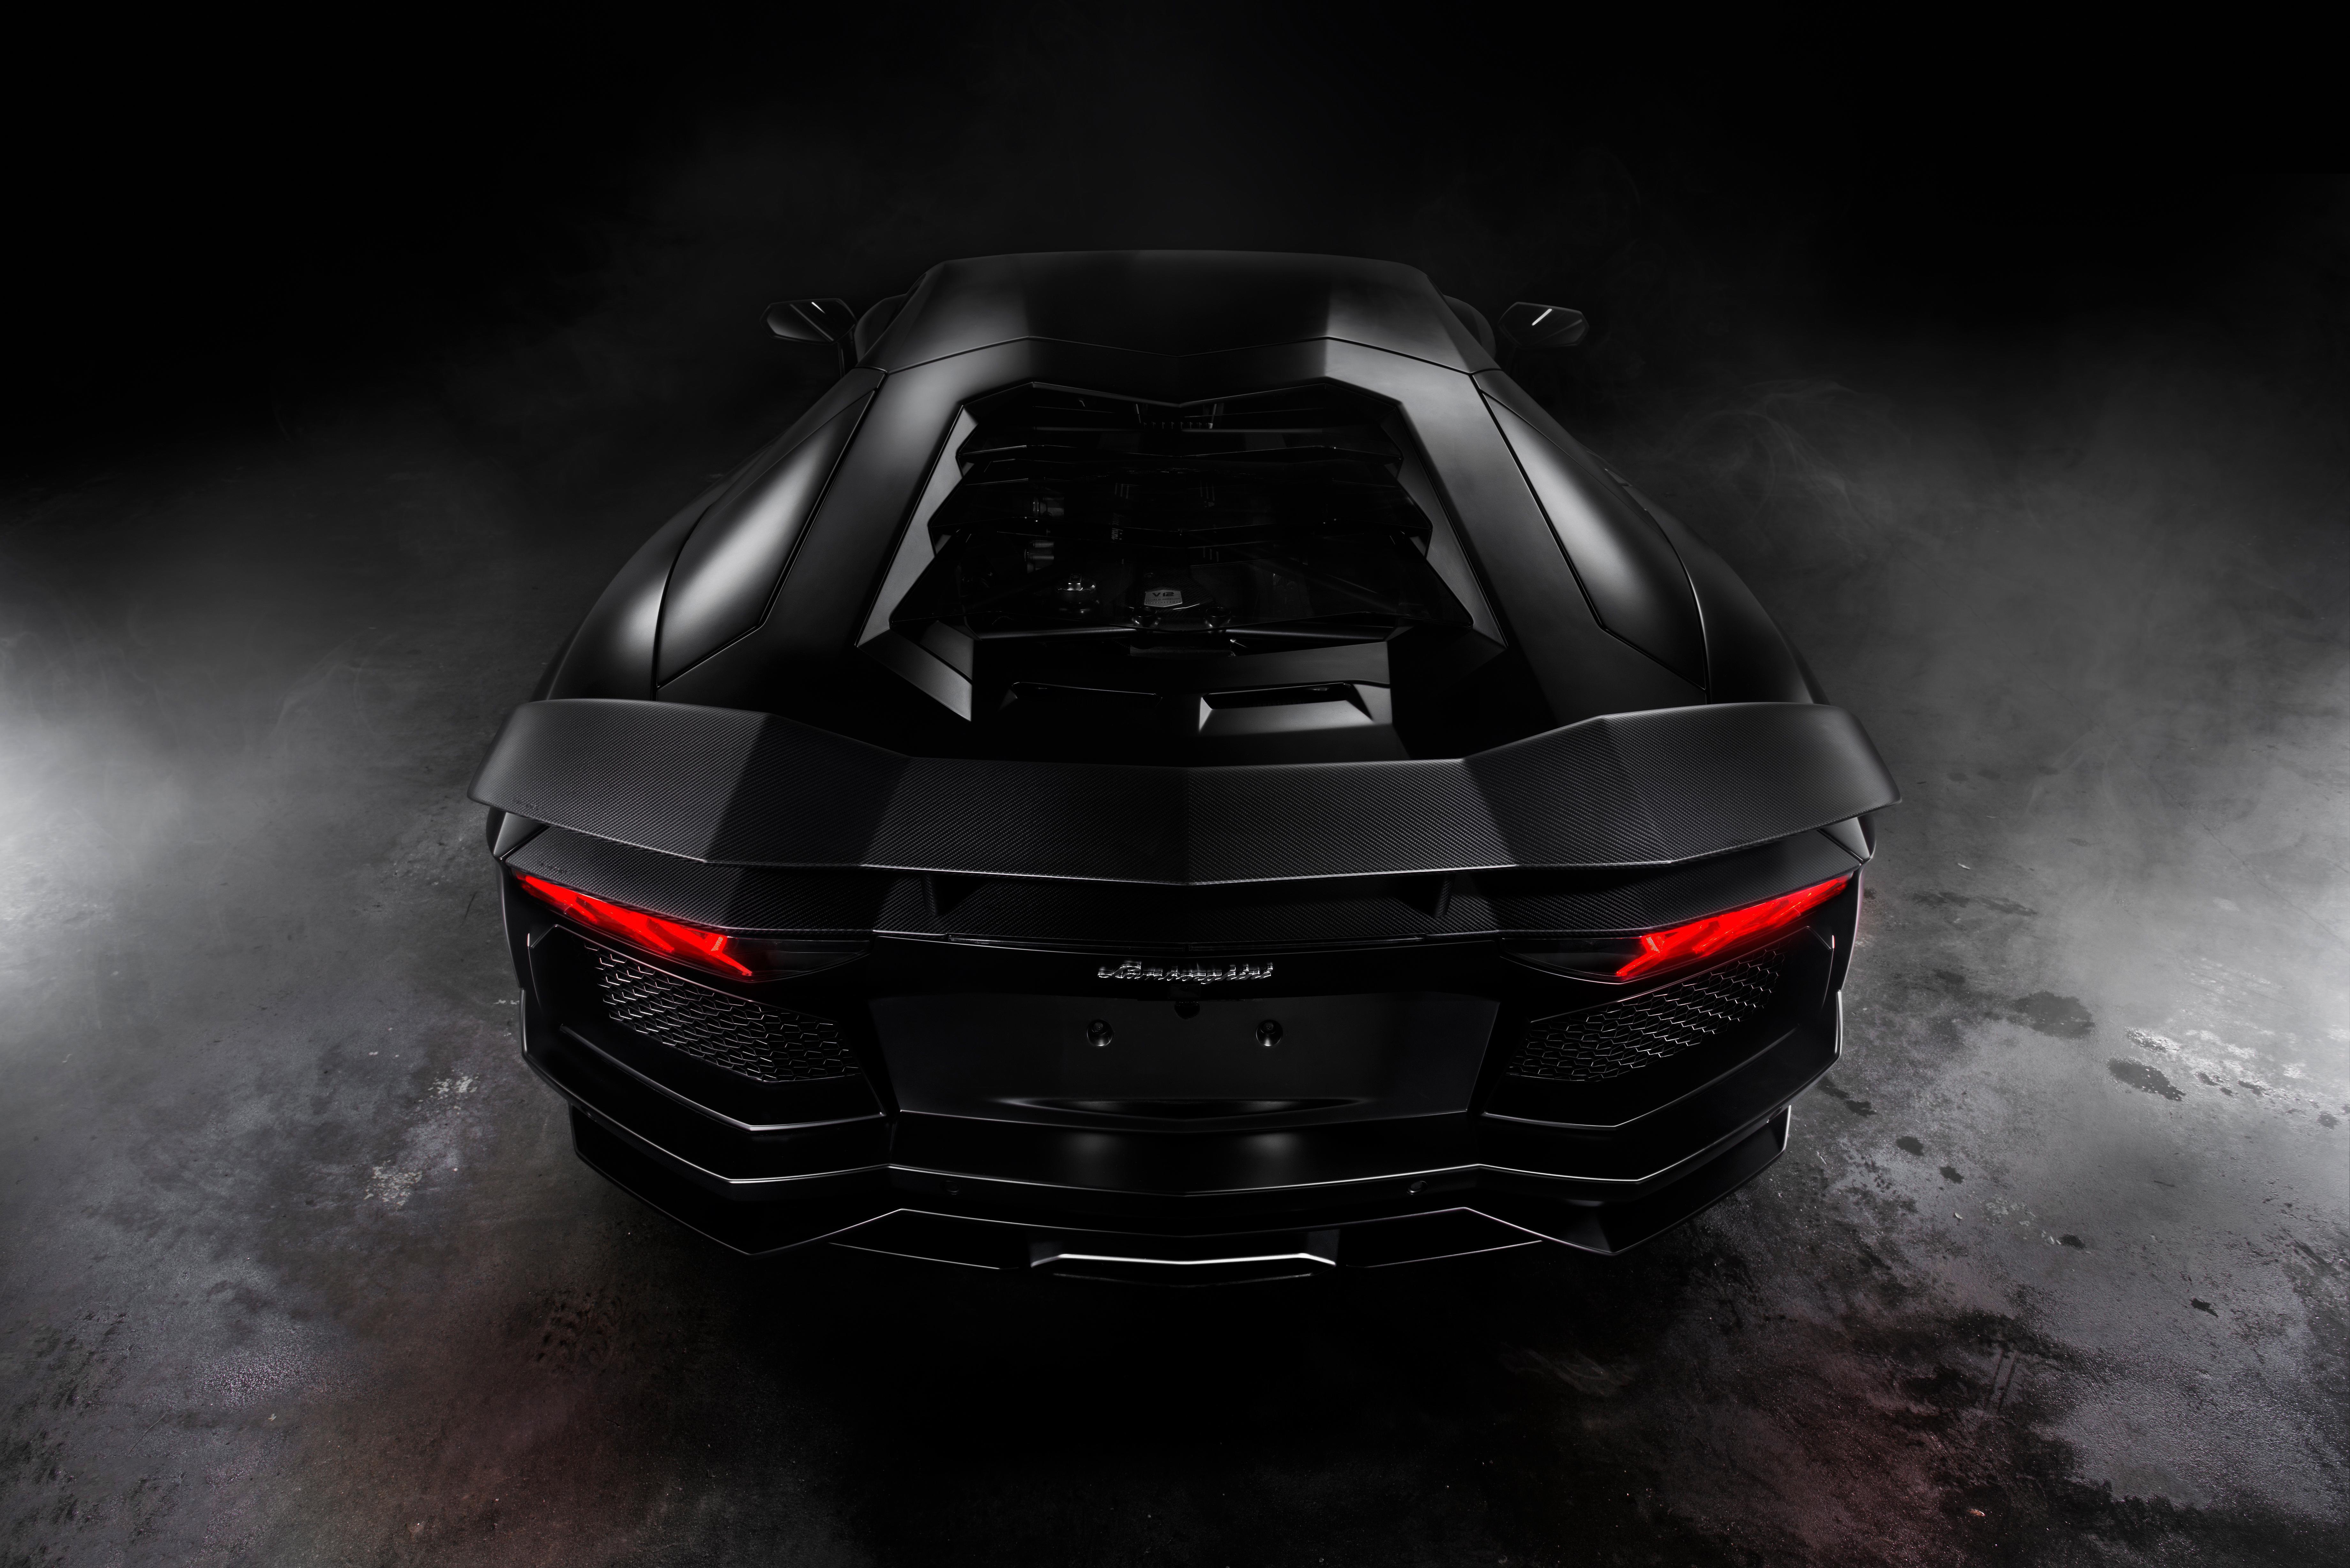 Black Lamborghini Aventador 8k, HD Cars, 4k Wallpapers ...